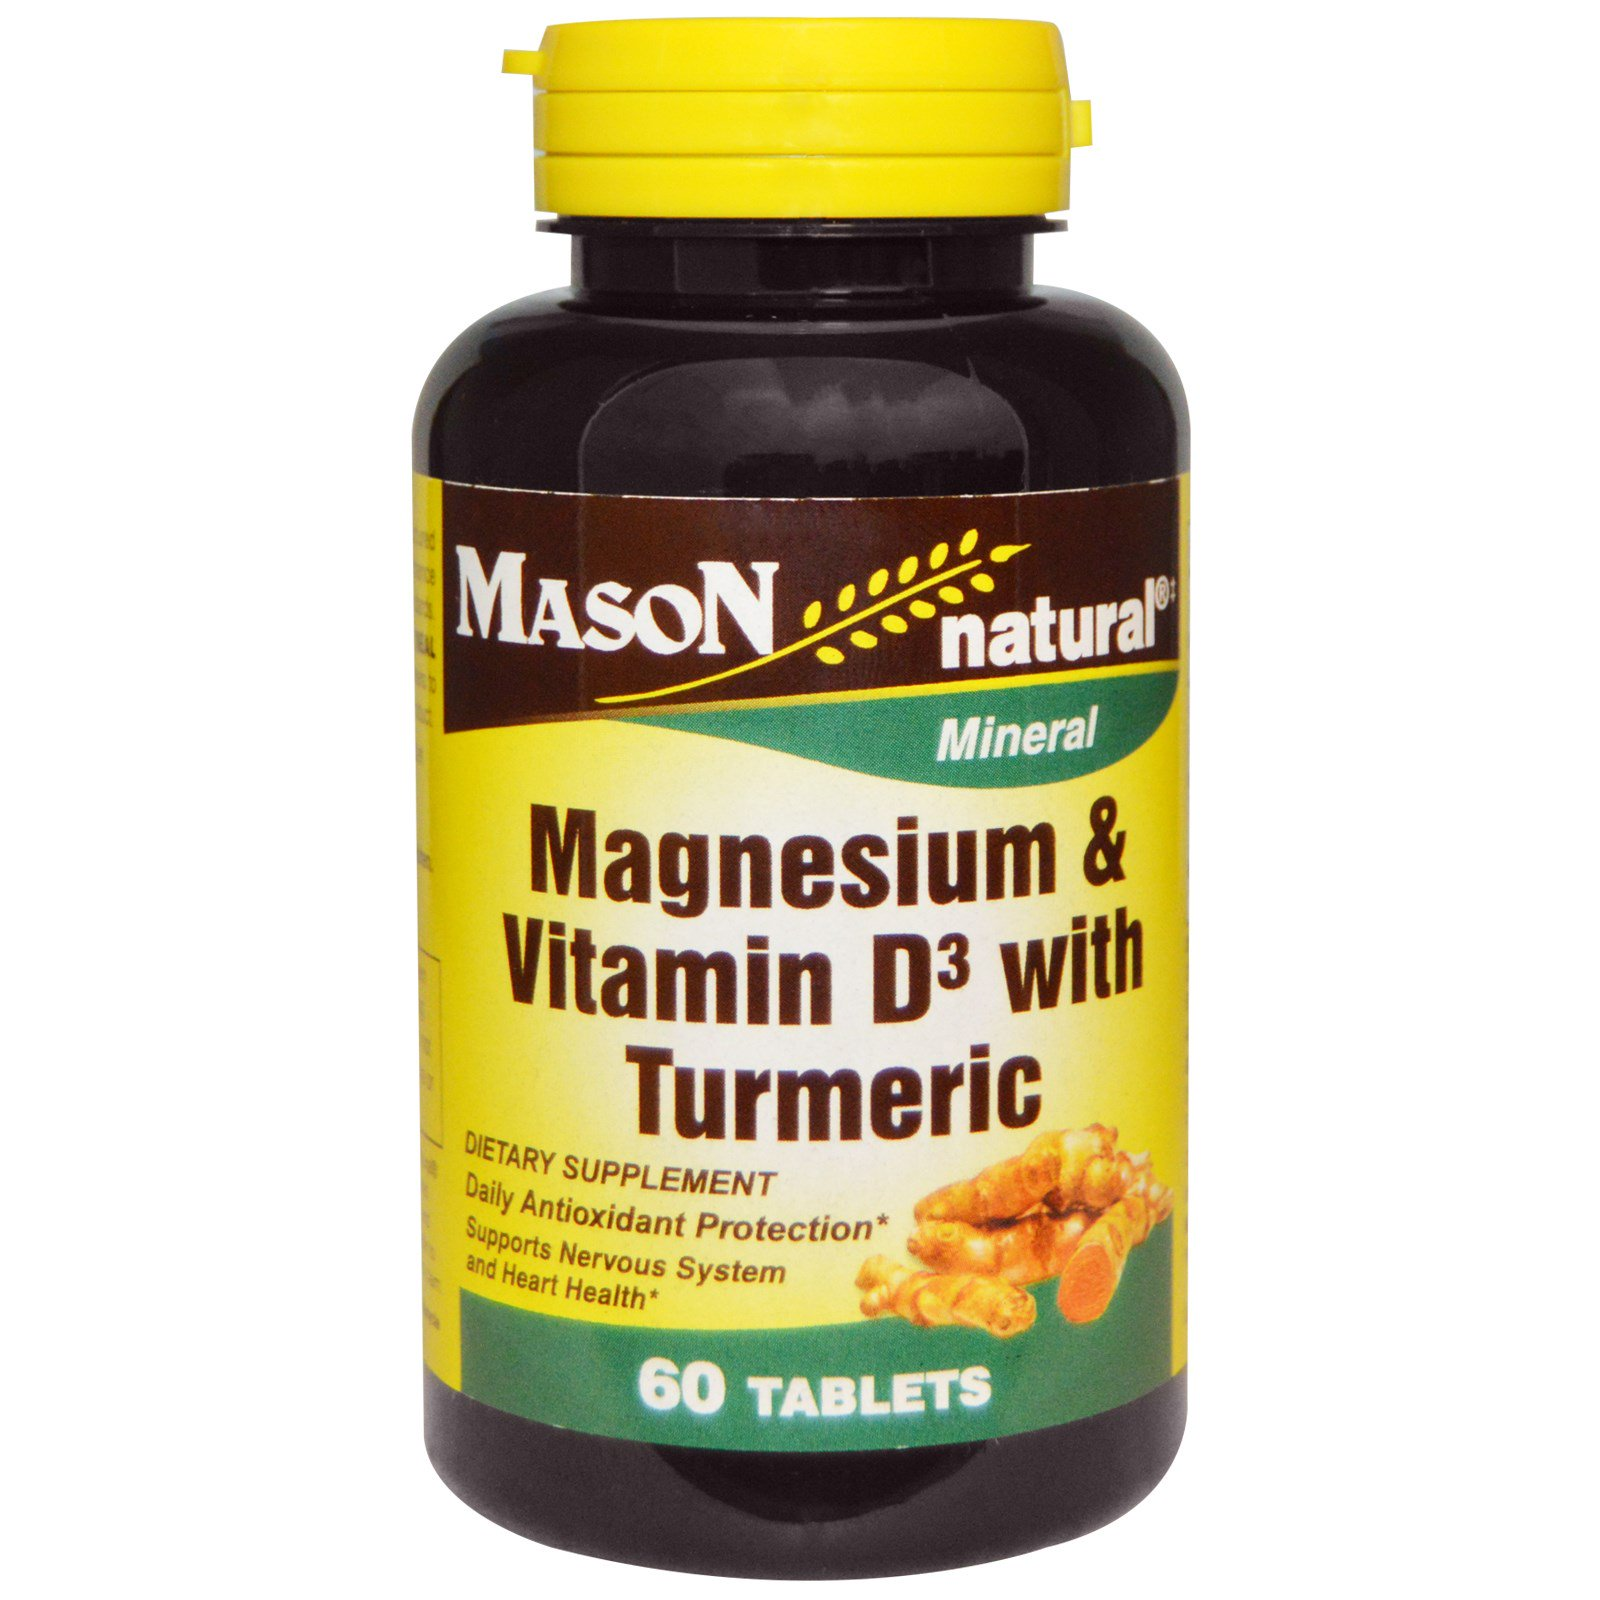 Mason Natural Magnesium Amp Vitamin D3 With Turmeric 60